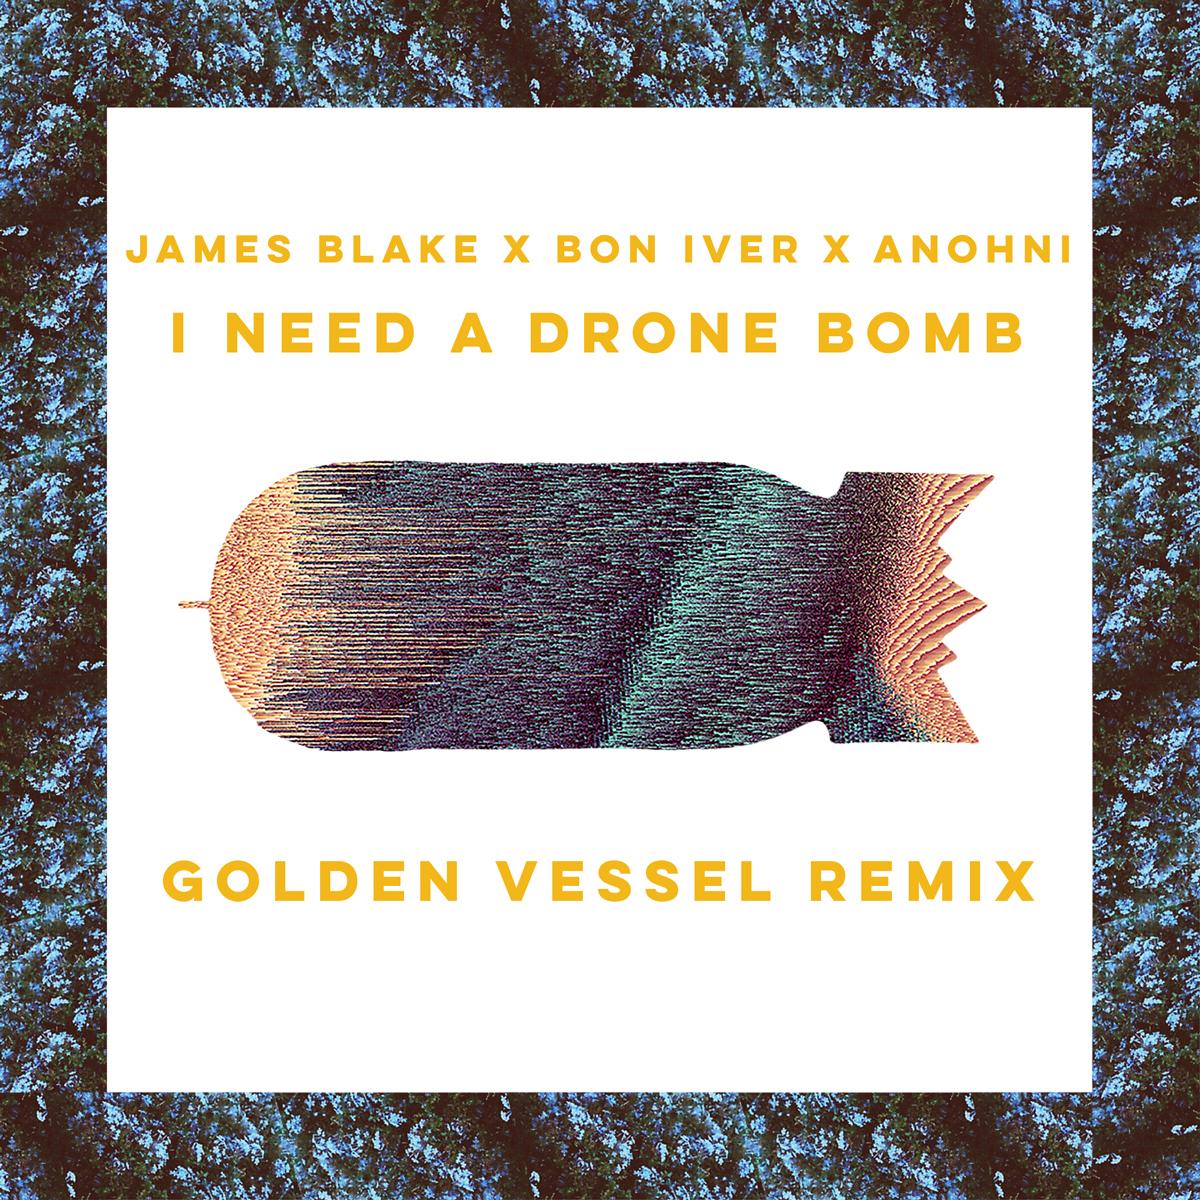 James Blake 10.08.2016ANDREW